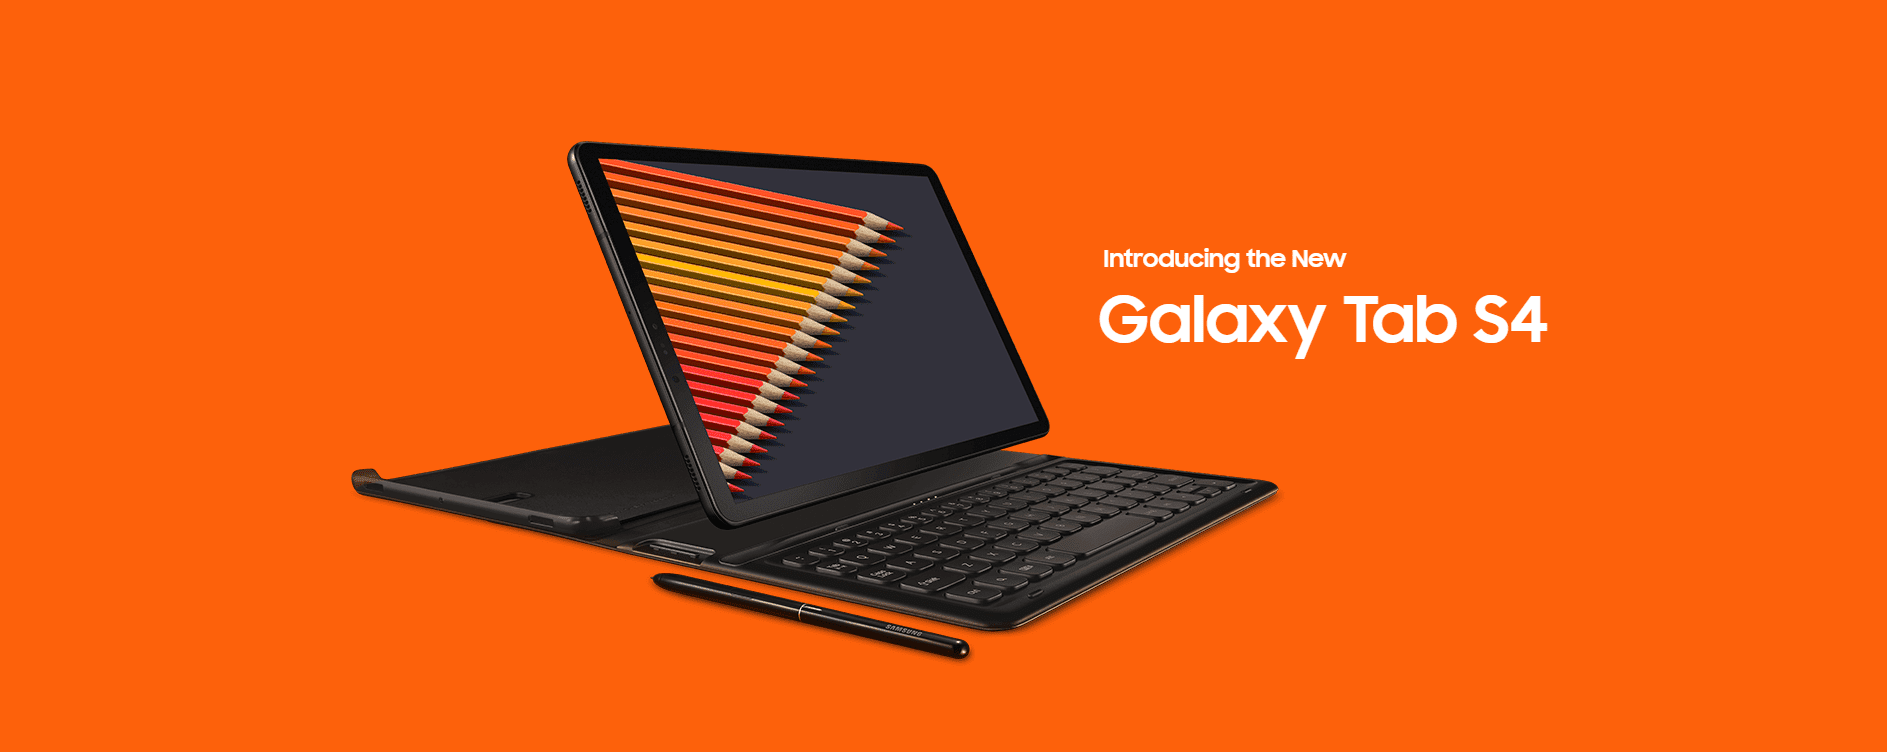 Новый мультизадачный планшет Samsung Galaxy Tab S4